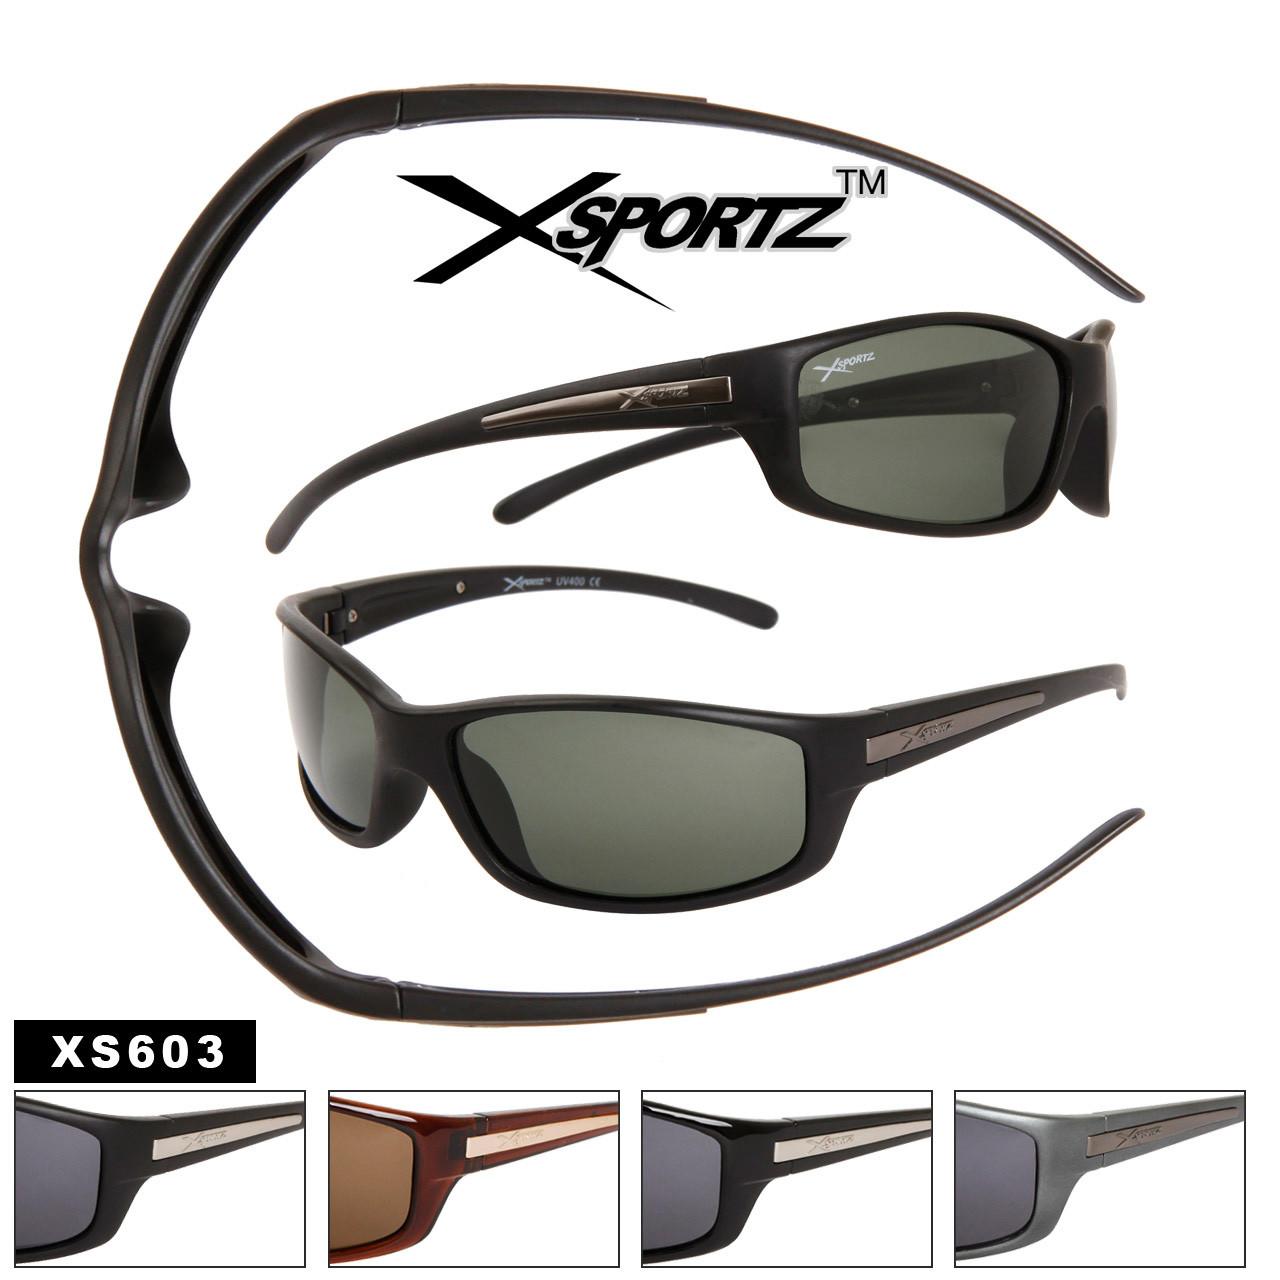 Polarized Sunglasses XS603